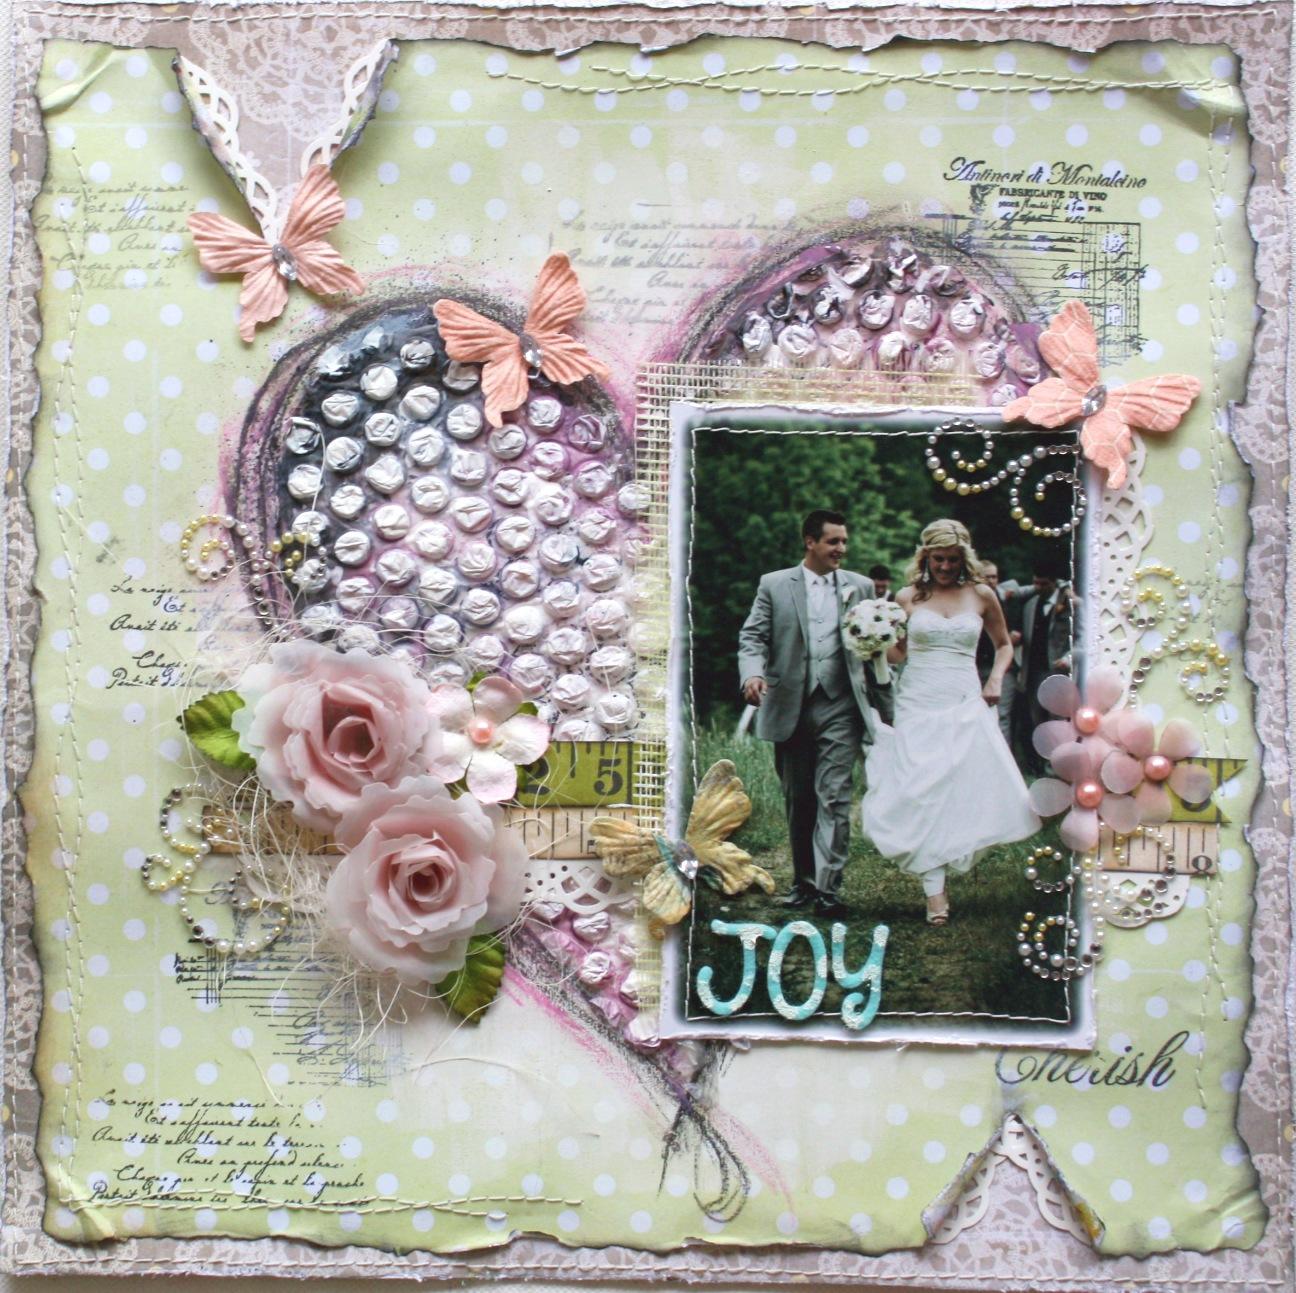 Wedding scrapbook ideas layouts - Monday May 13 2013